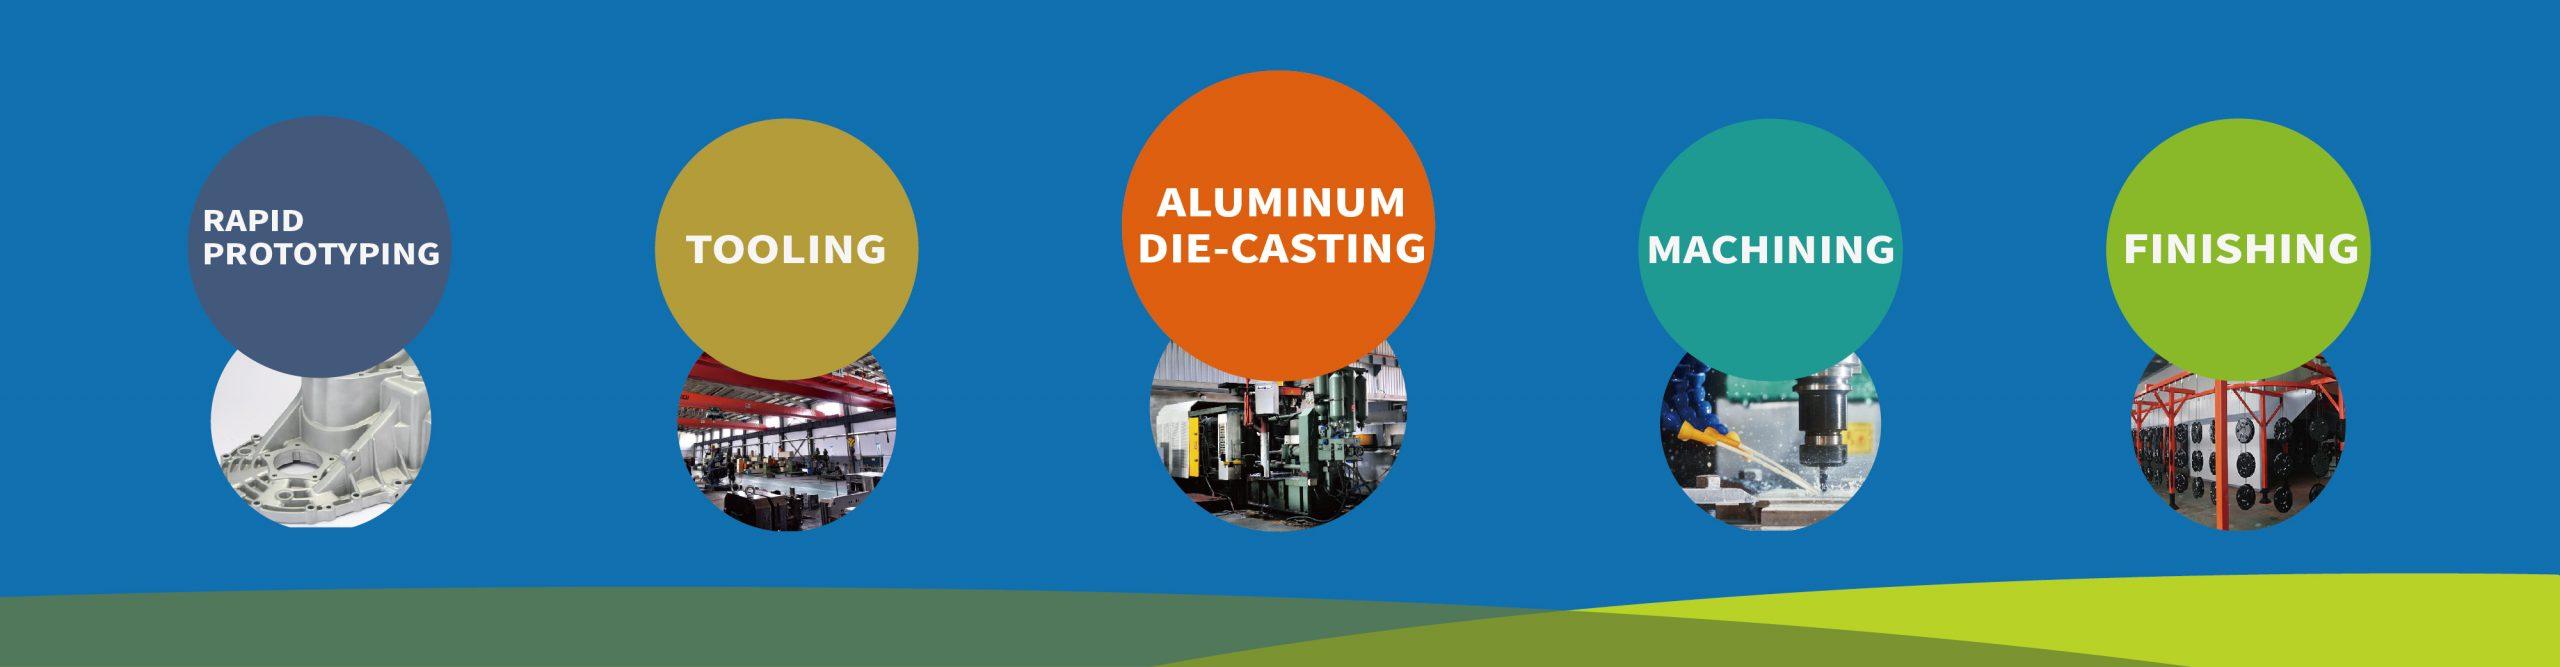 One-stop aluminum die casting manufacturing